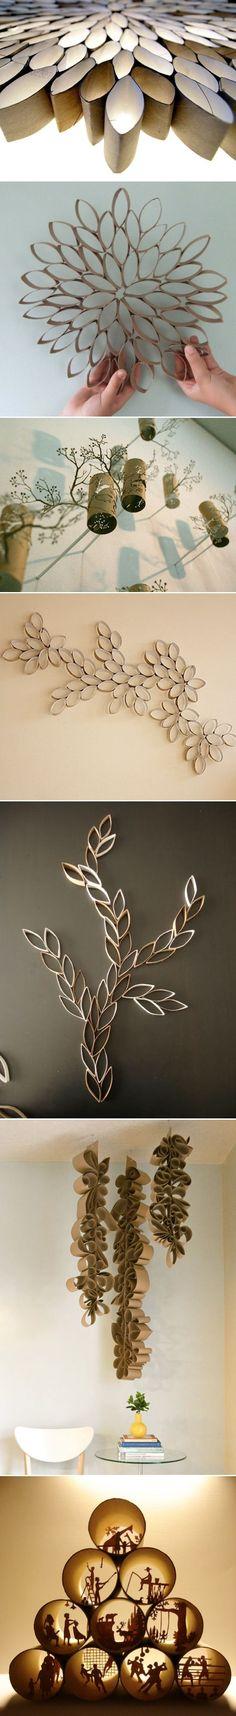 DIY Paper Roll Crafts